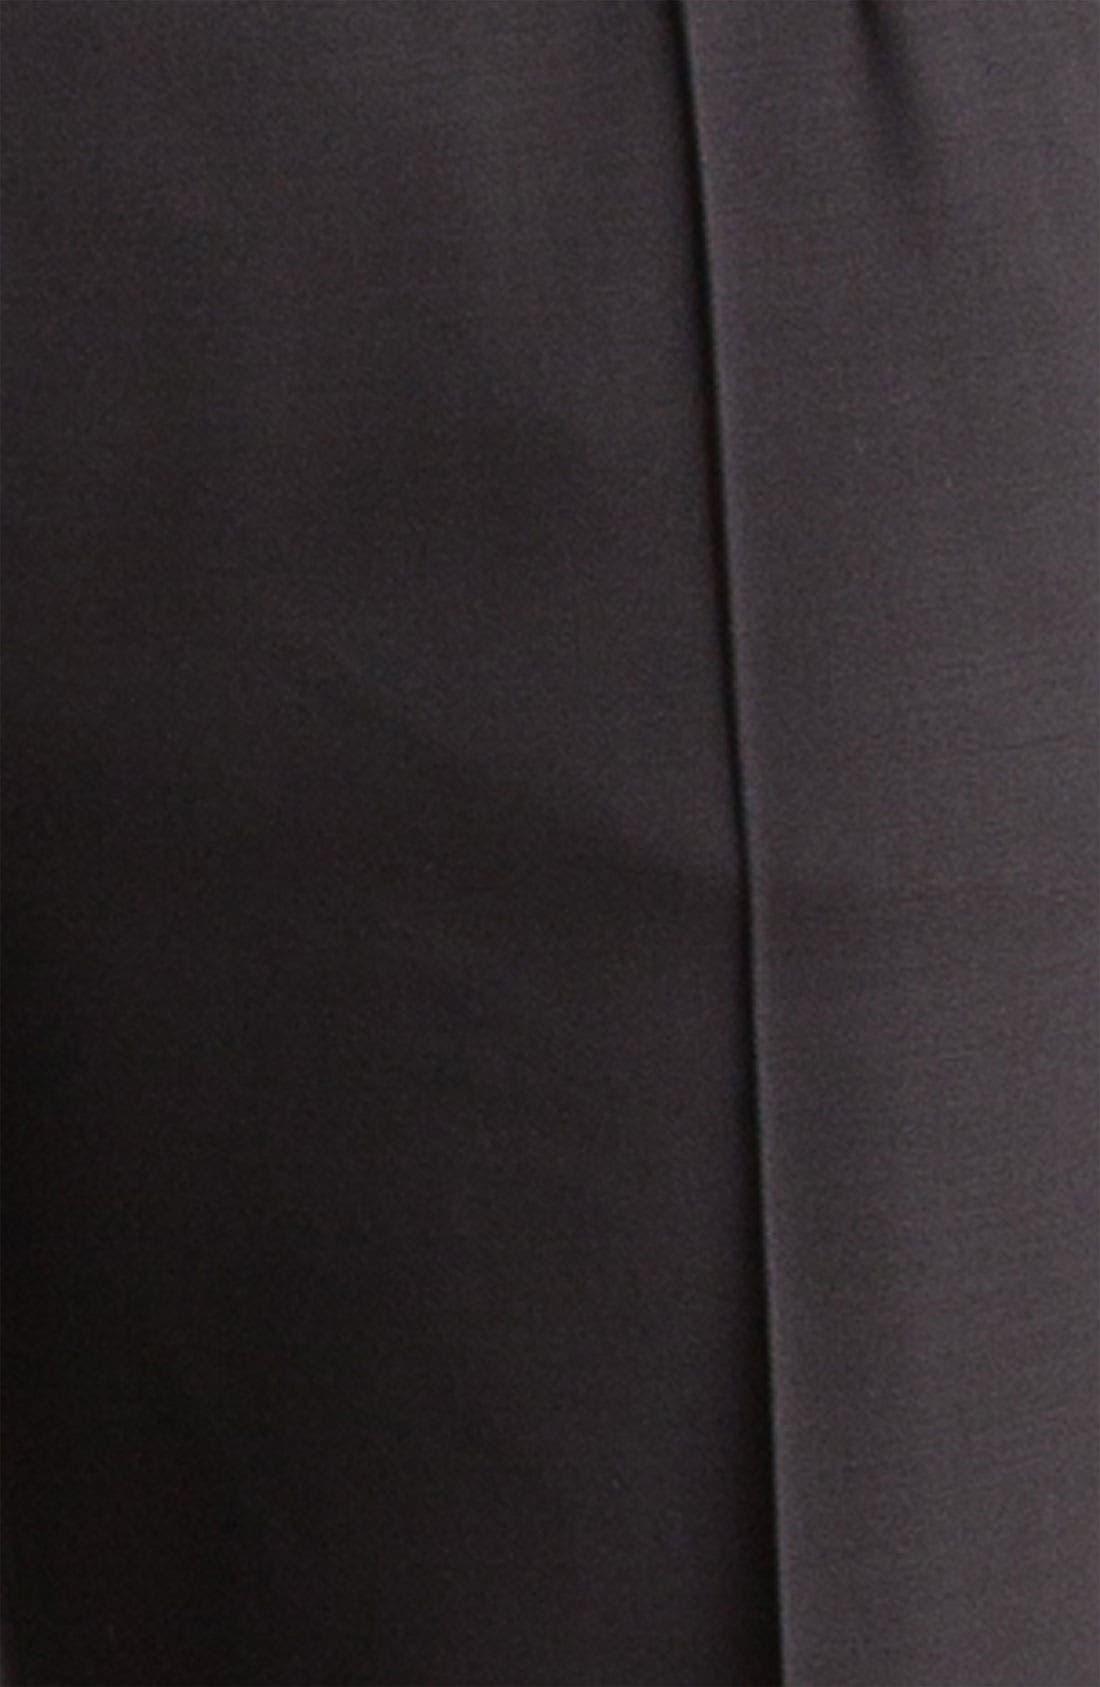 Straight Leg Stretch Wool Trousers,                             Alternate thumbnail 11, color,                             BLACK